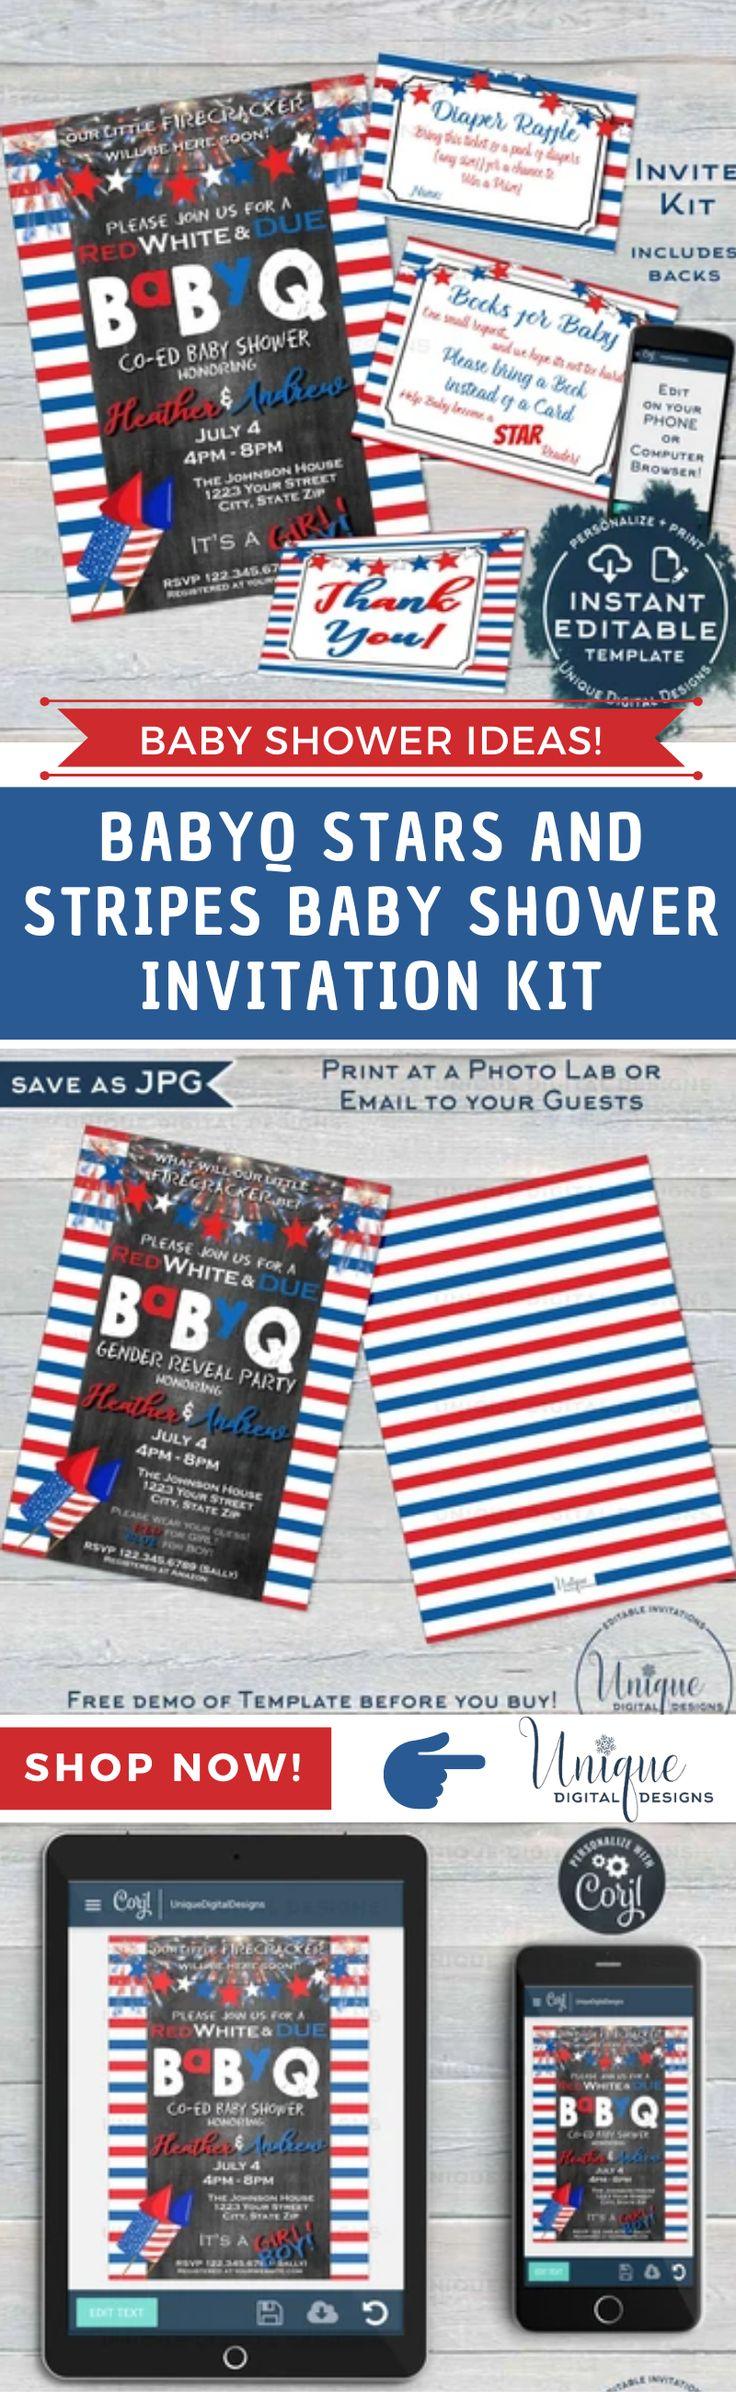 Babyq stars and stripes baby shower invitation kit